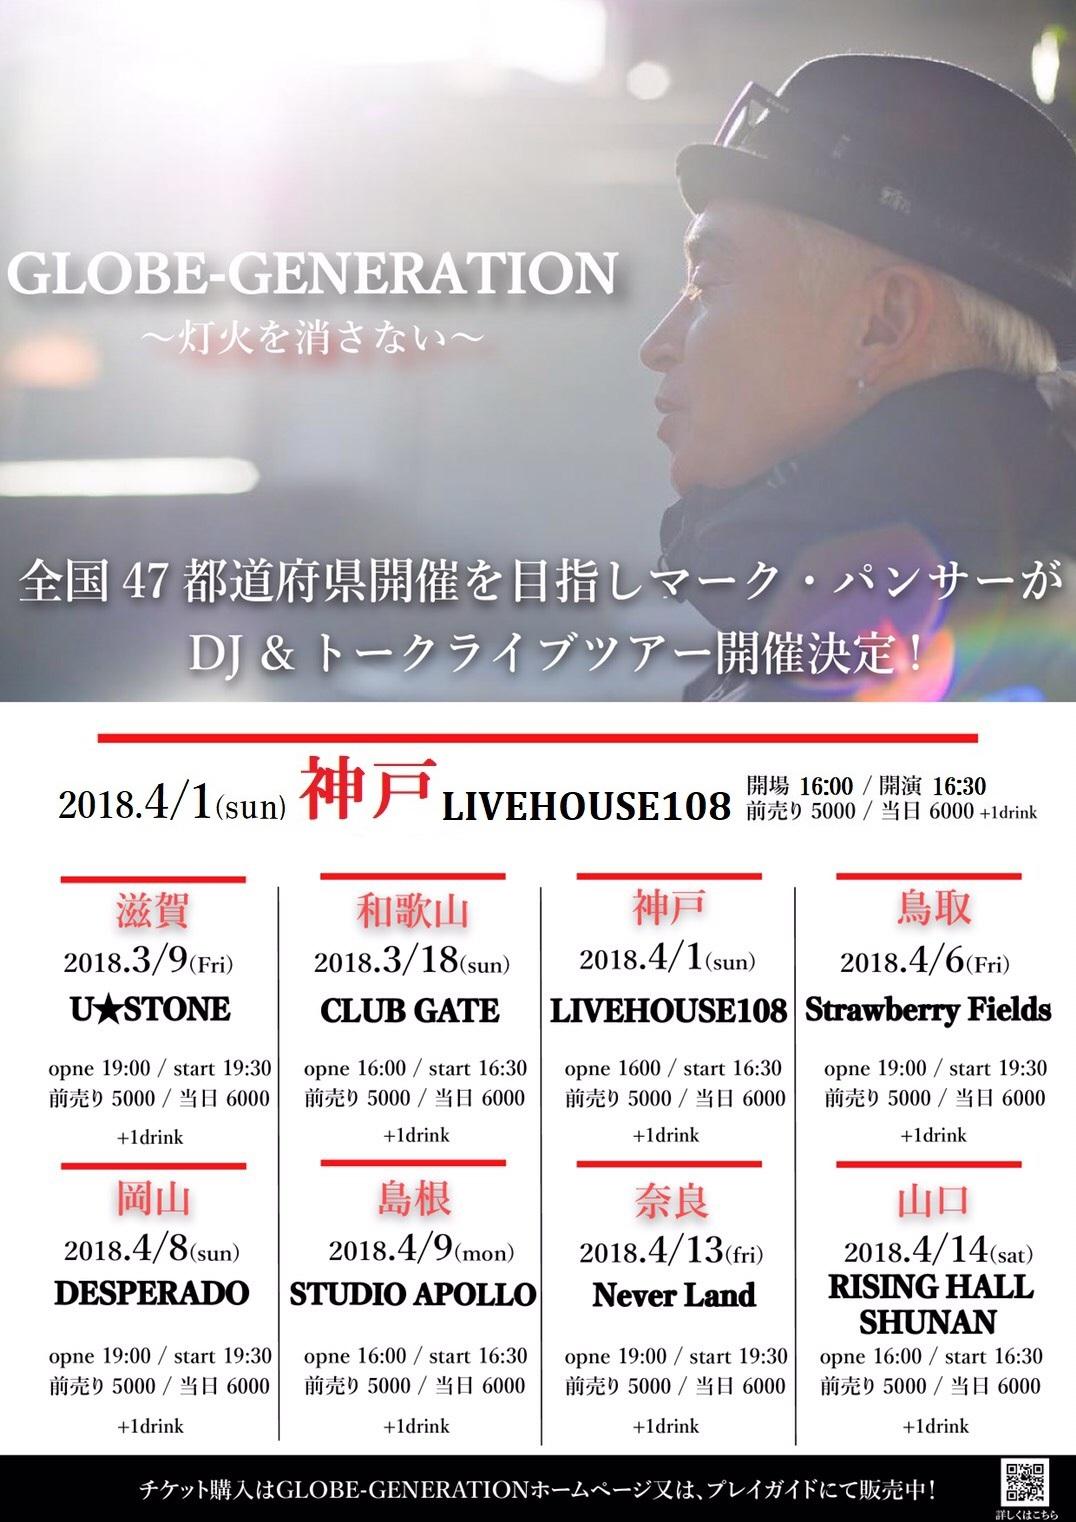 GLOBE-GENERATION 〜灯火を消さない〜